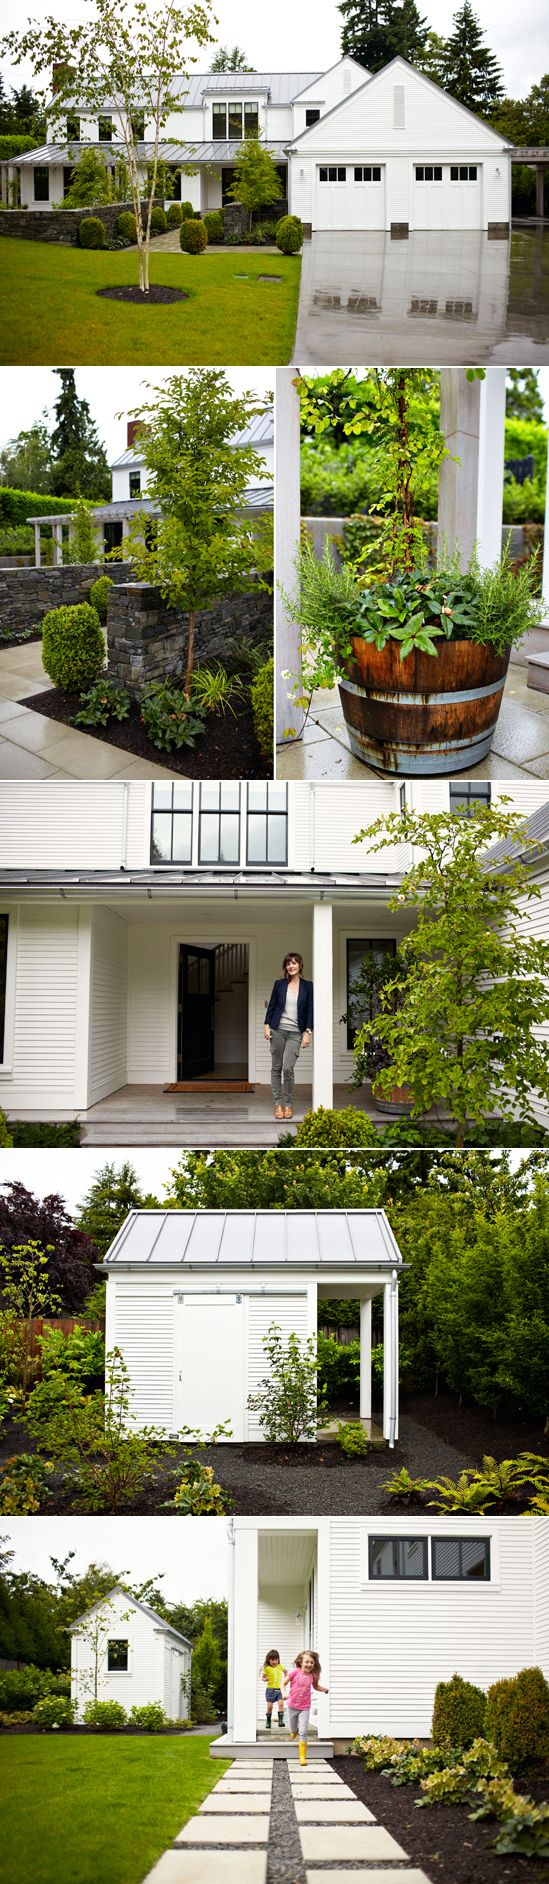 best house dream home images on pinterest